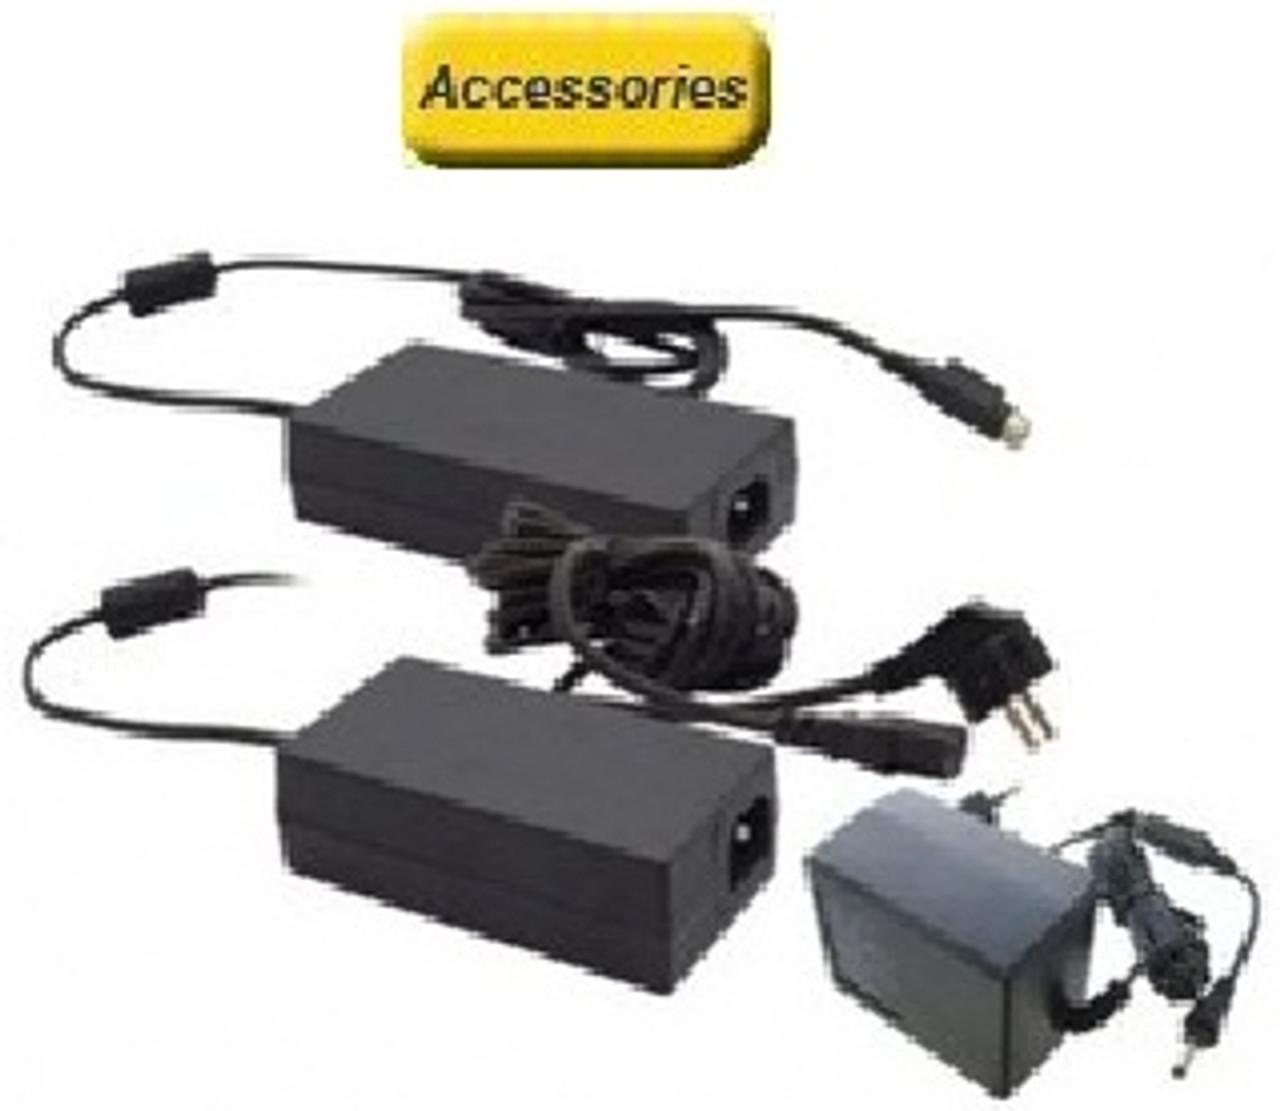 TTP 7030 Accessories